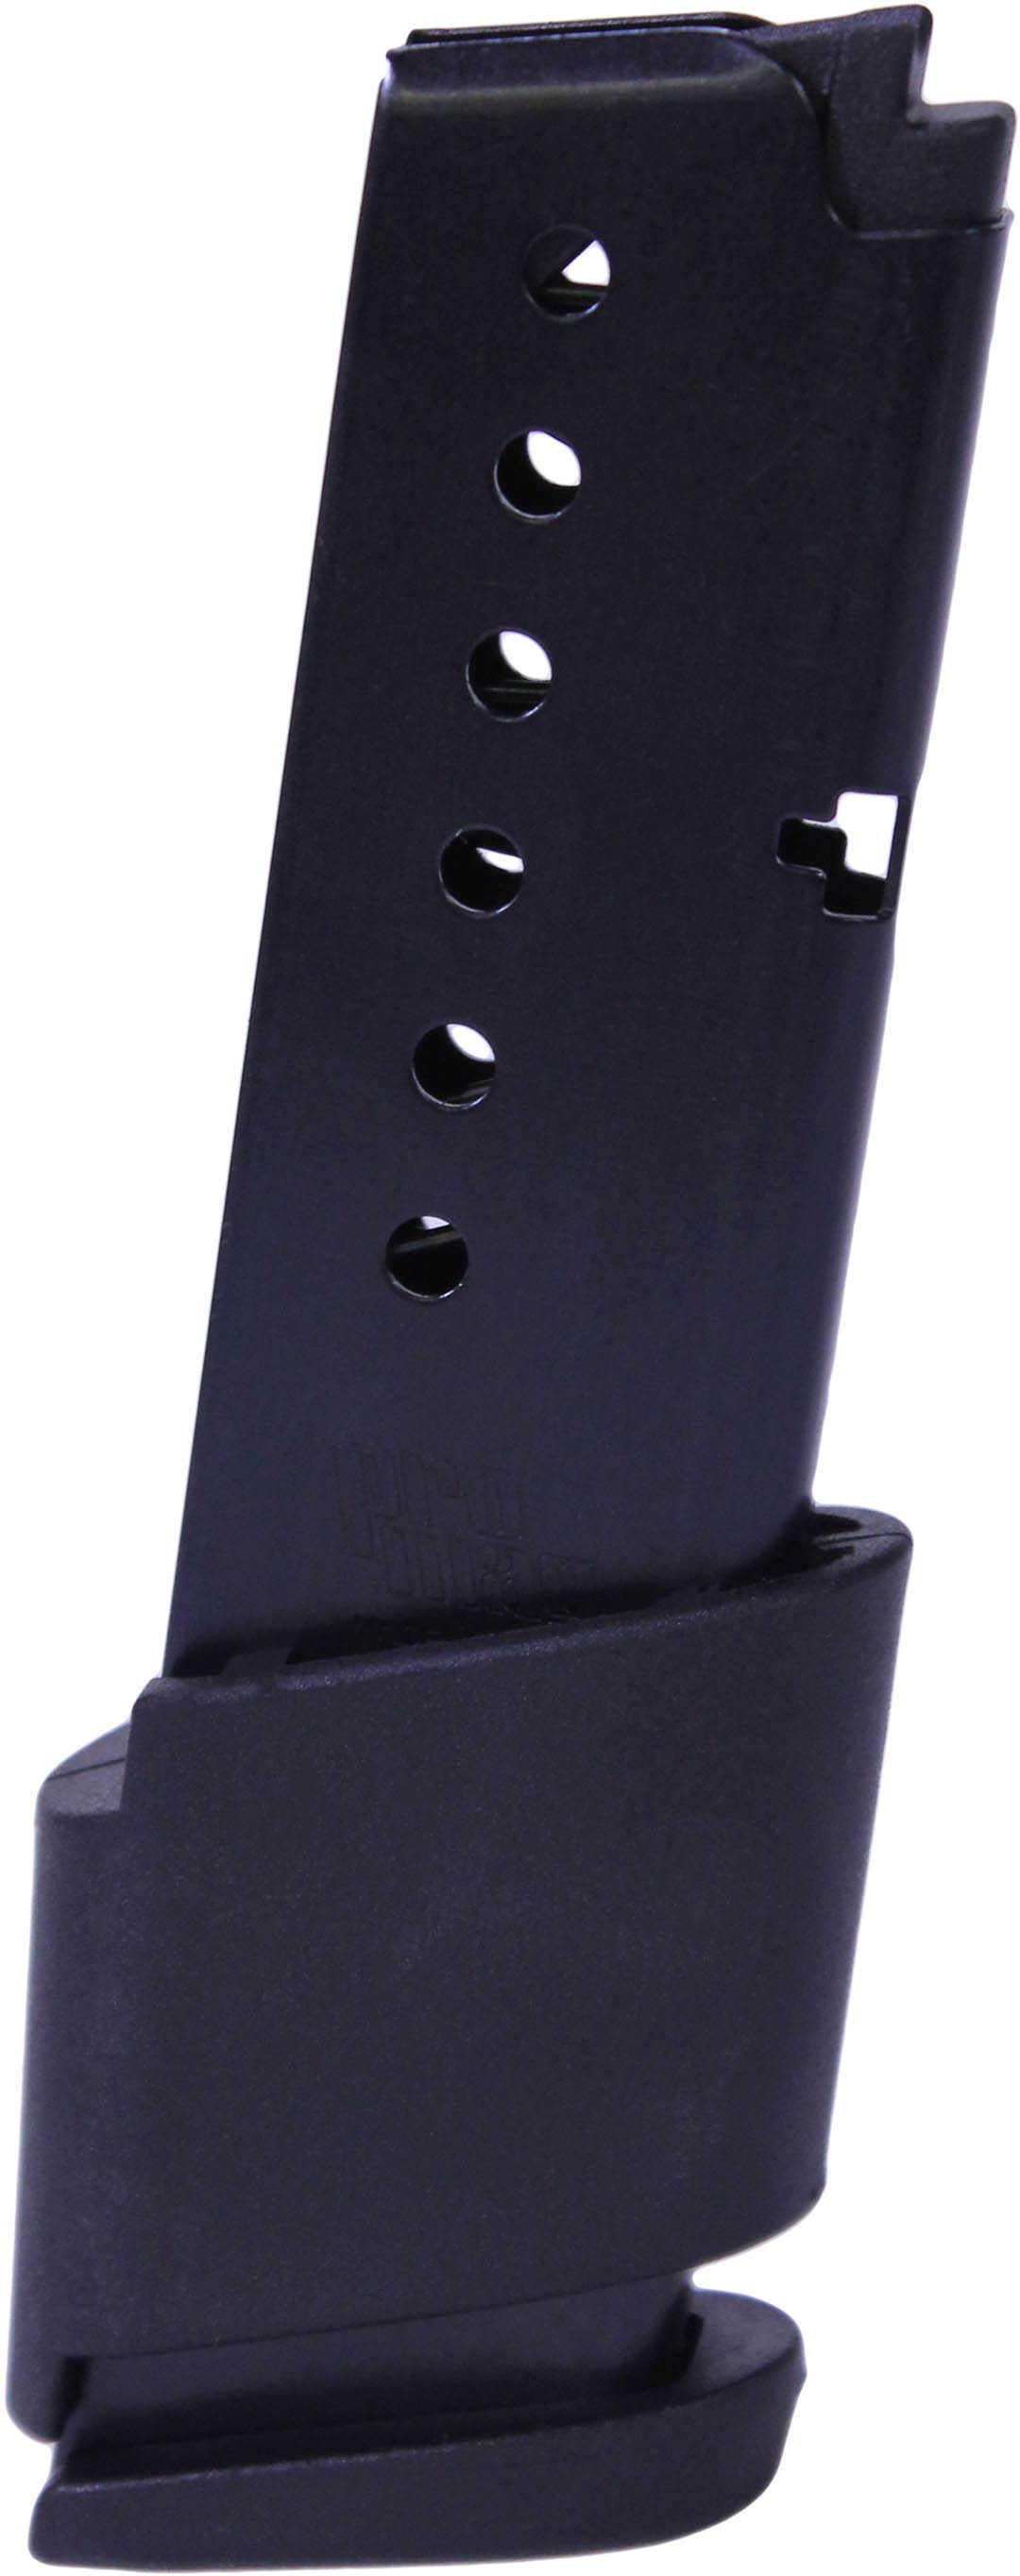 ProMag Taurus 709 Slim Magazine 9mm, 10 Rounds, Blue Steel Md: TAU 22